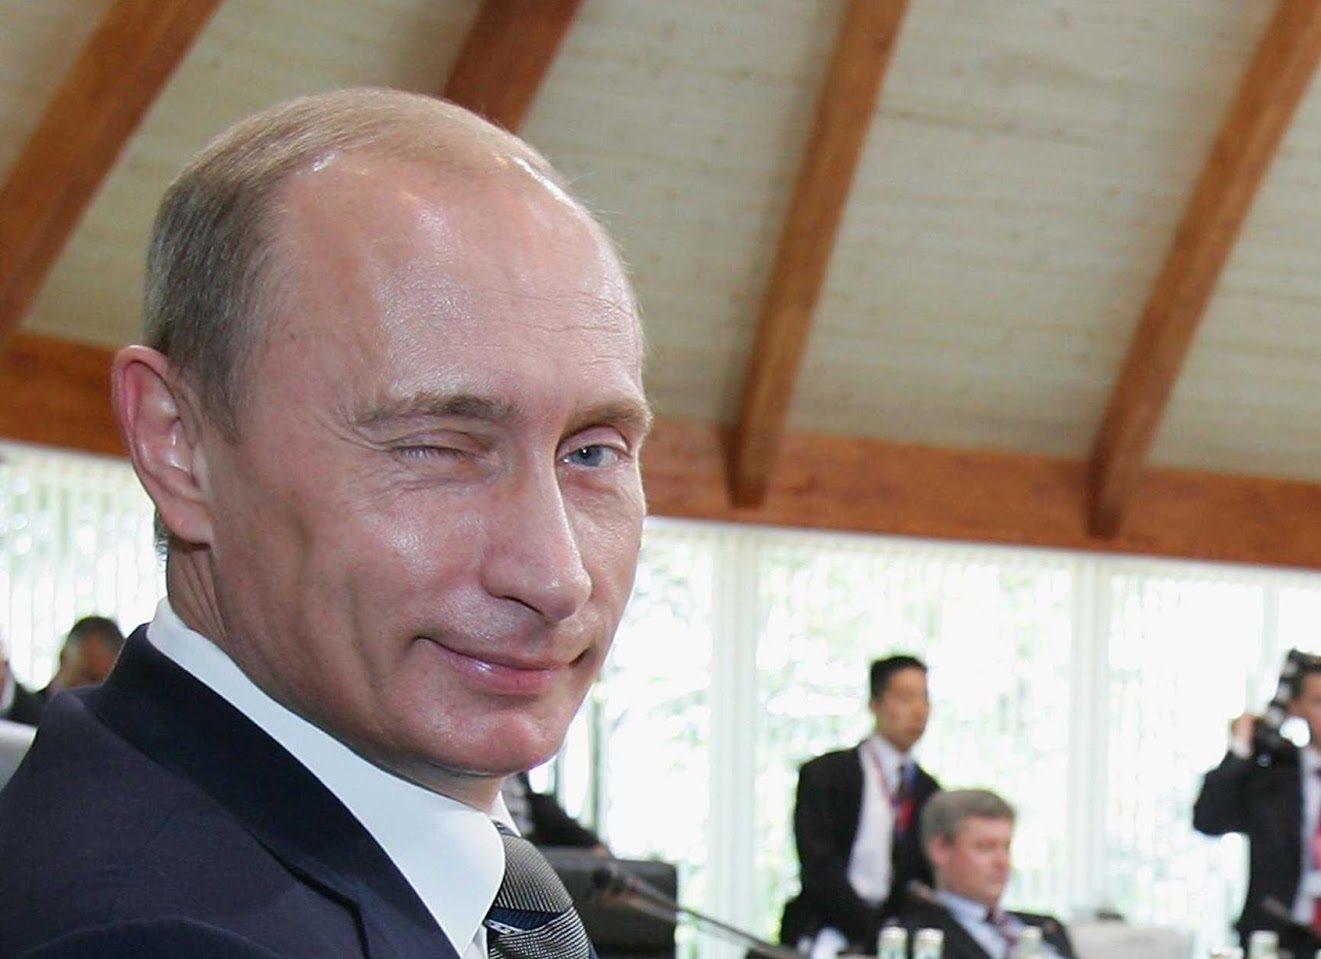 Vladimir-Putin-Wink-e1477989163795.jpg